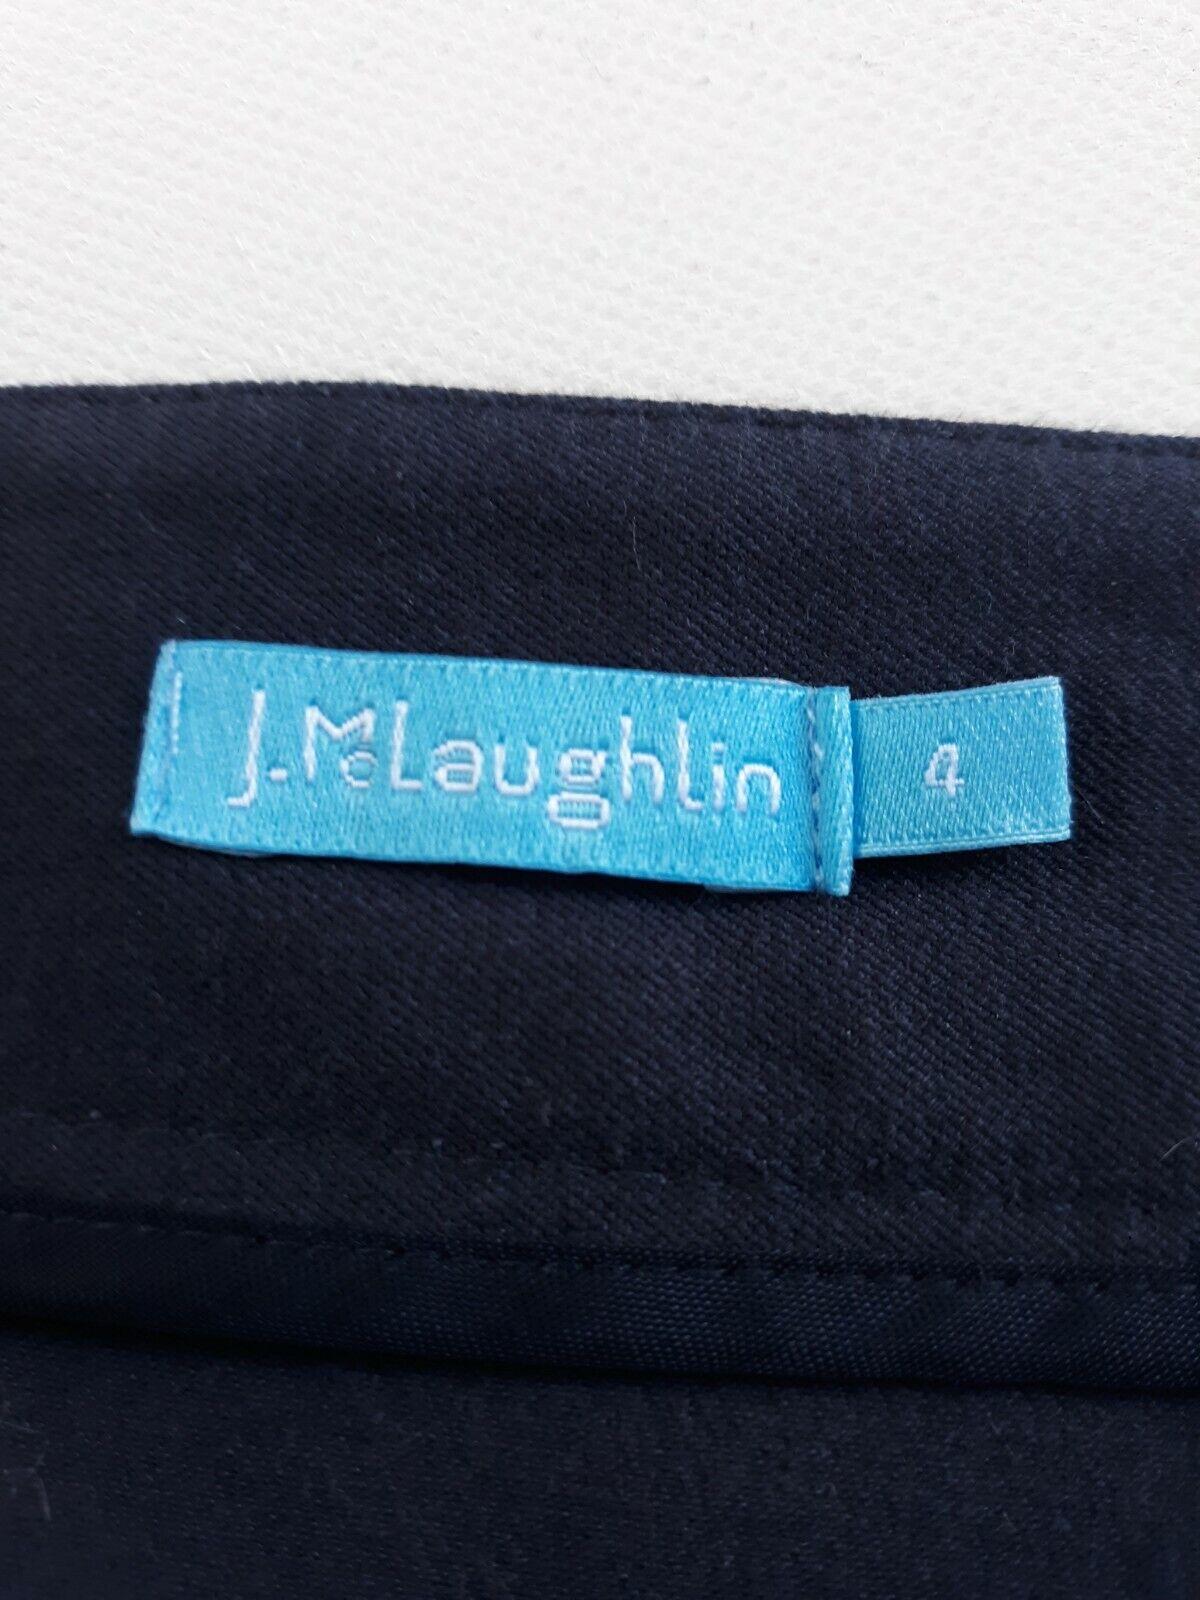 J McLaughlin Teal Button Front A Line Skirt Size 2 - image 12